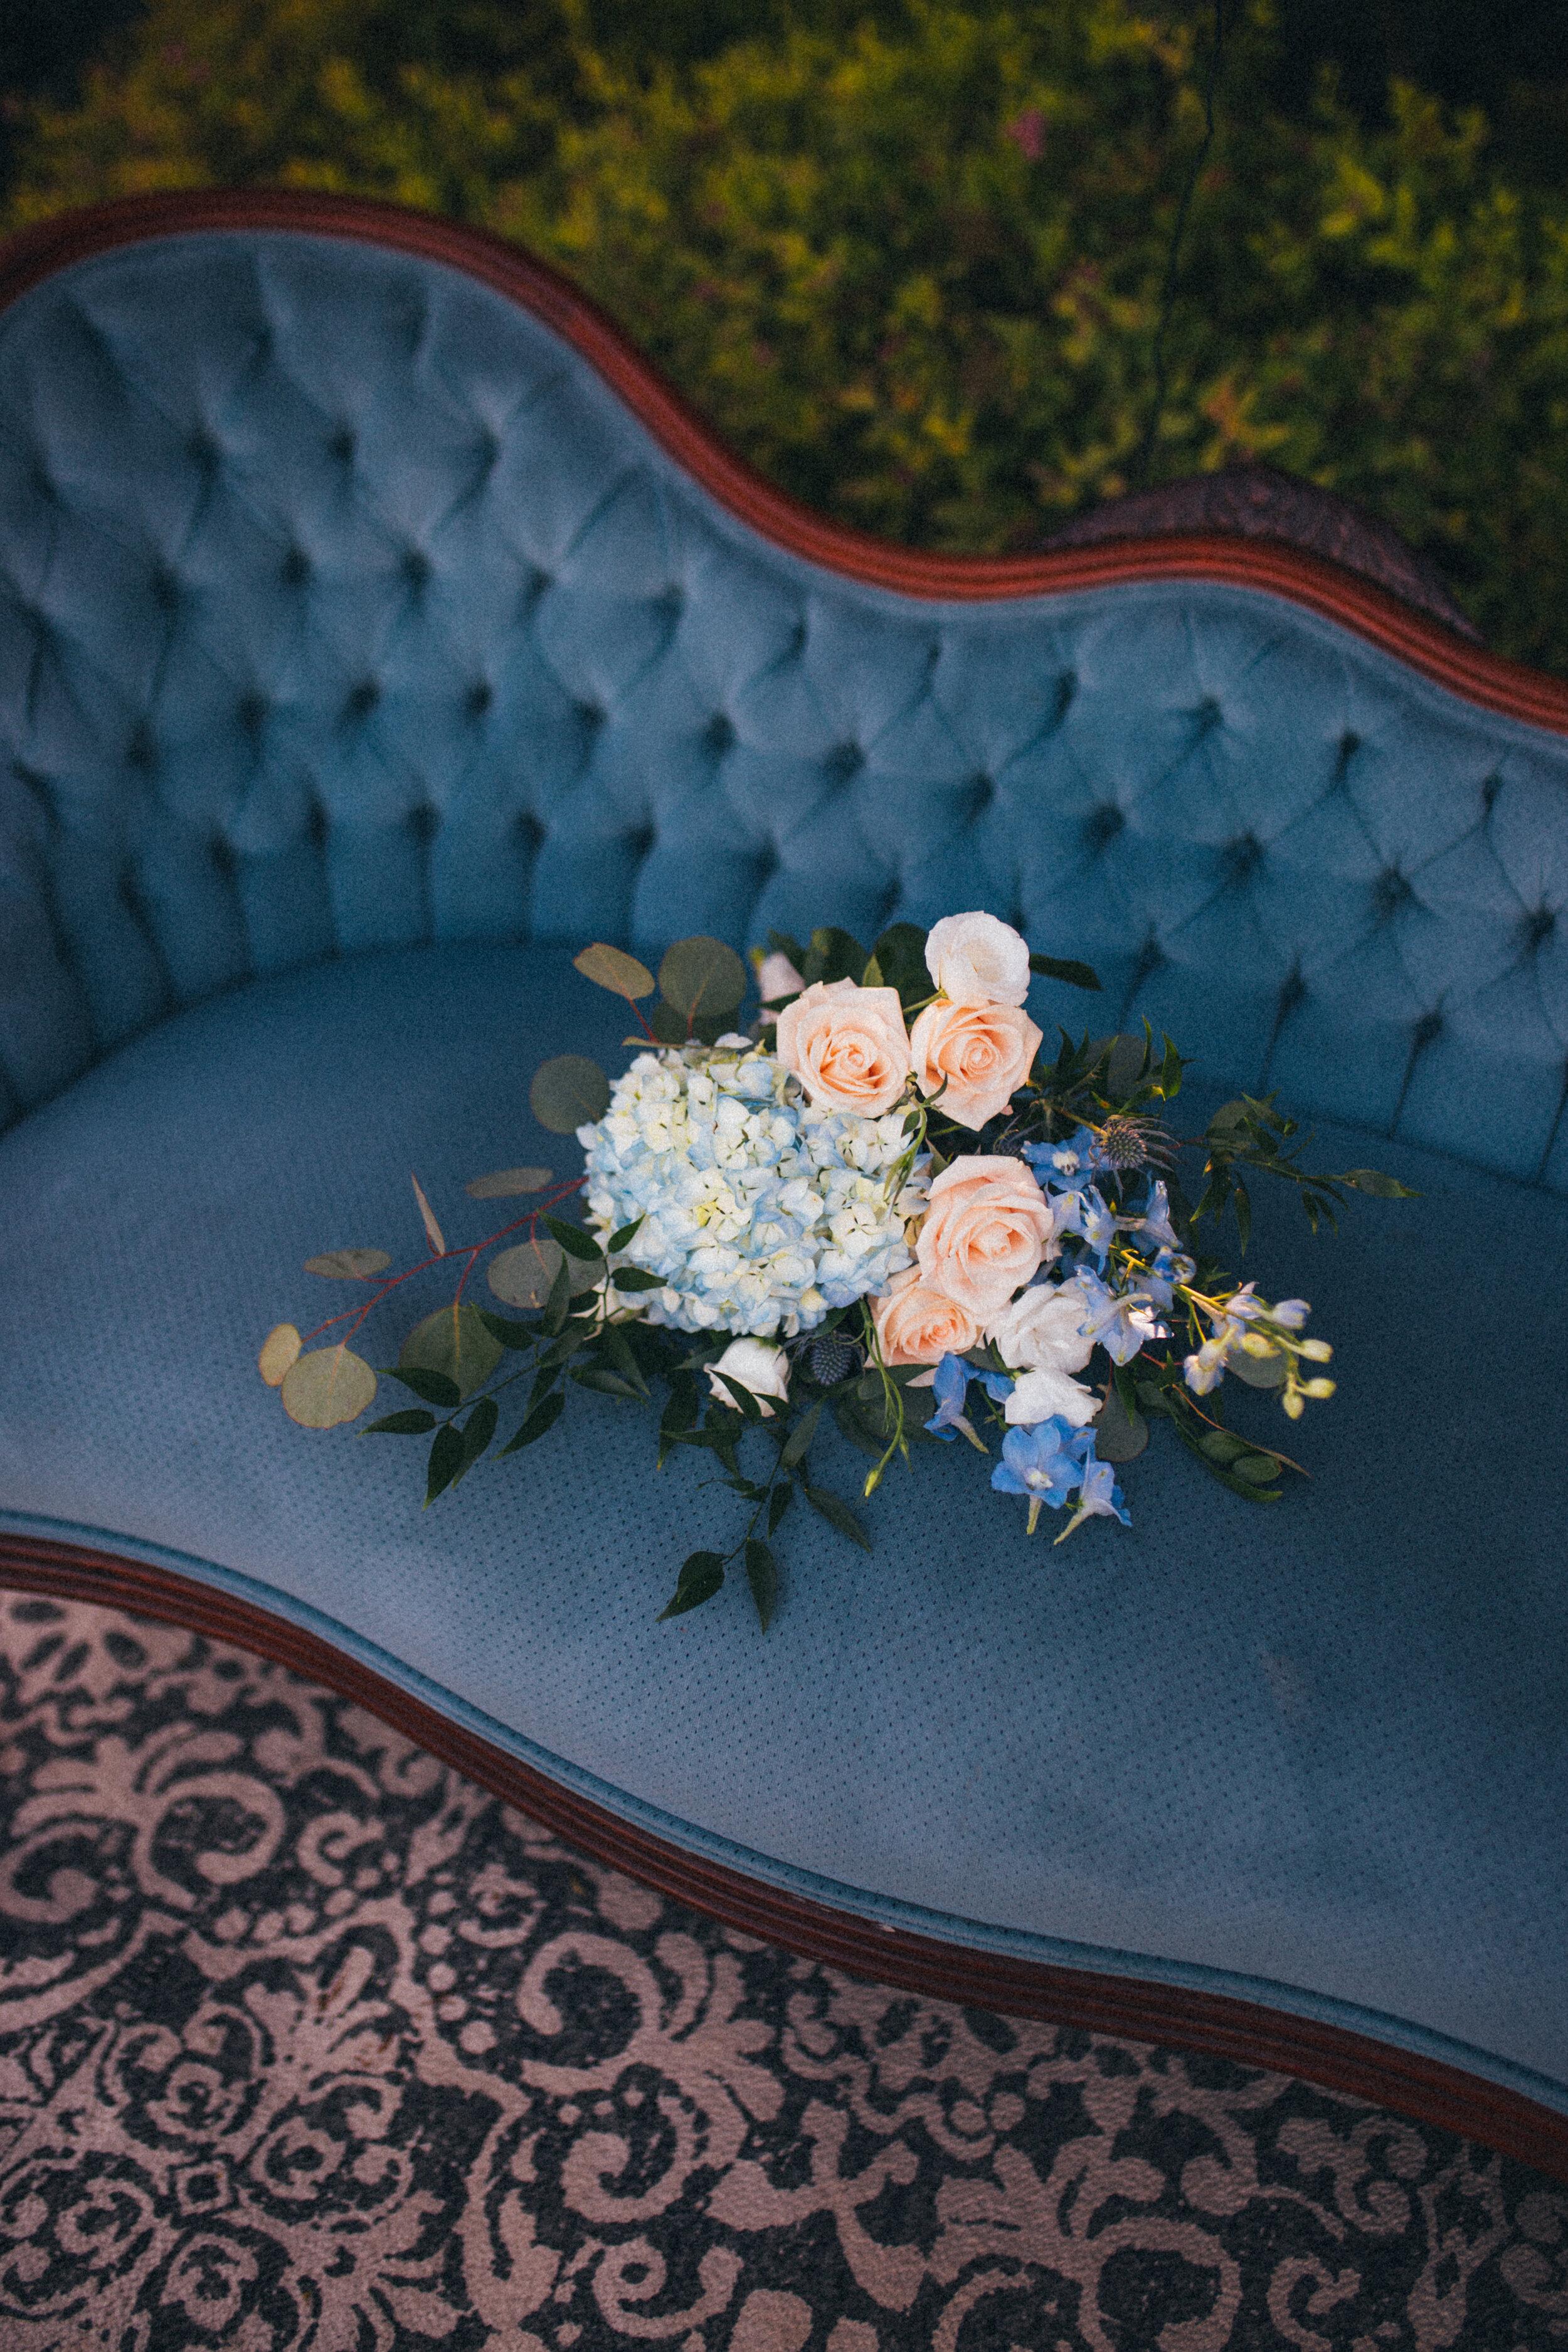 Bridal Bouquet with Hydrangeas, Delphinium and Juliet Roses